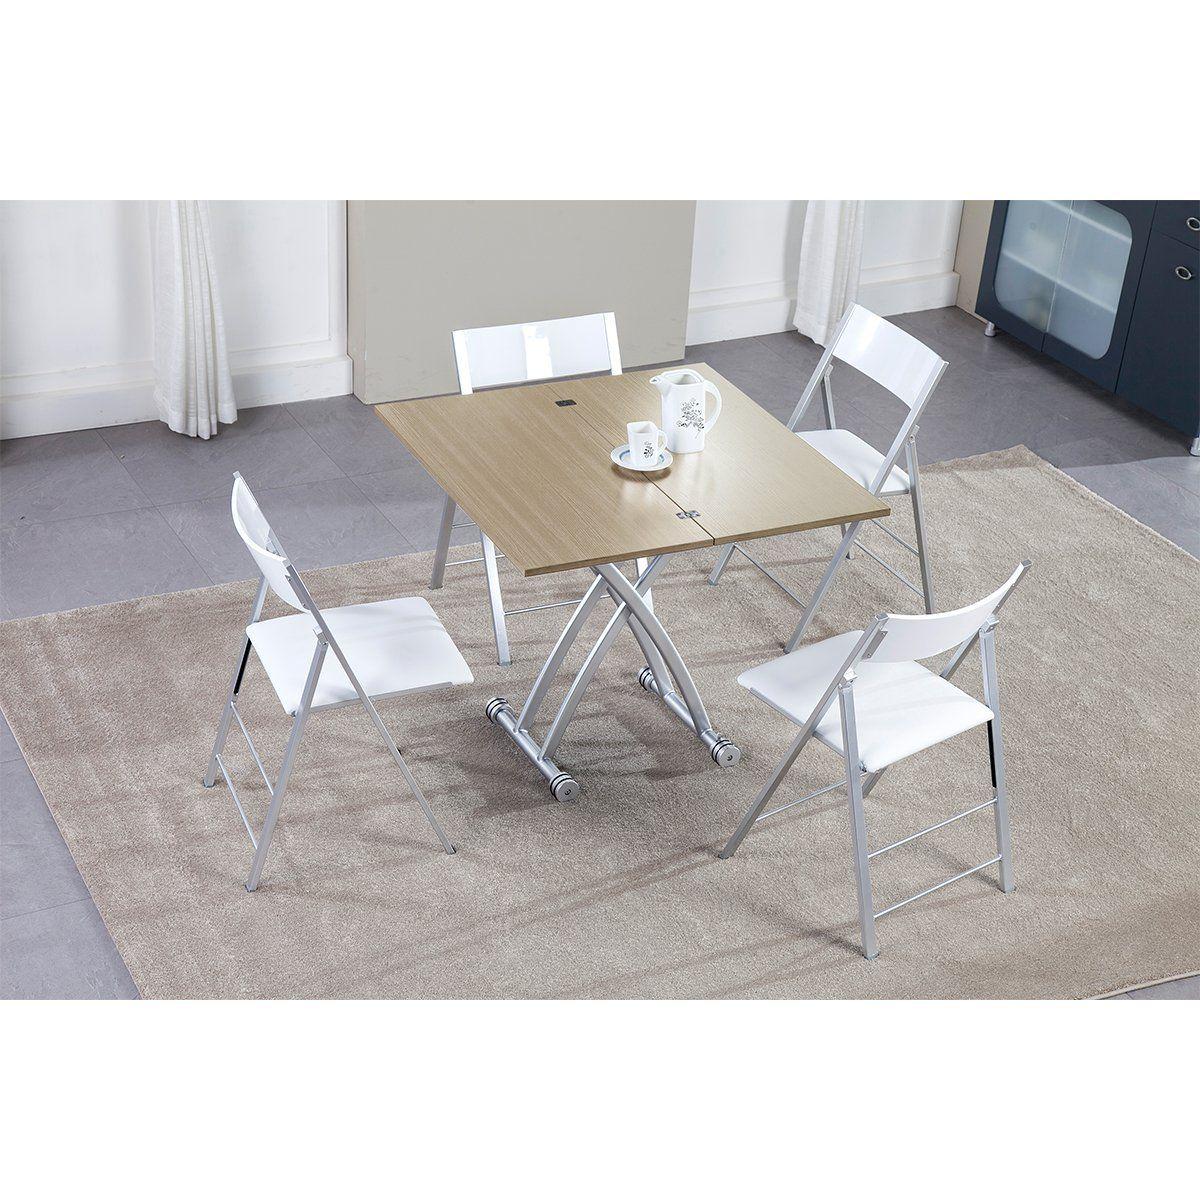 Amazoncouk DEVAISE Height Adjustable Multifunction Coffee Table